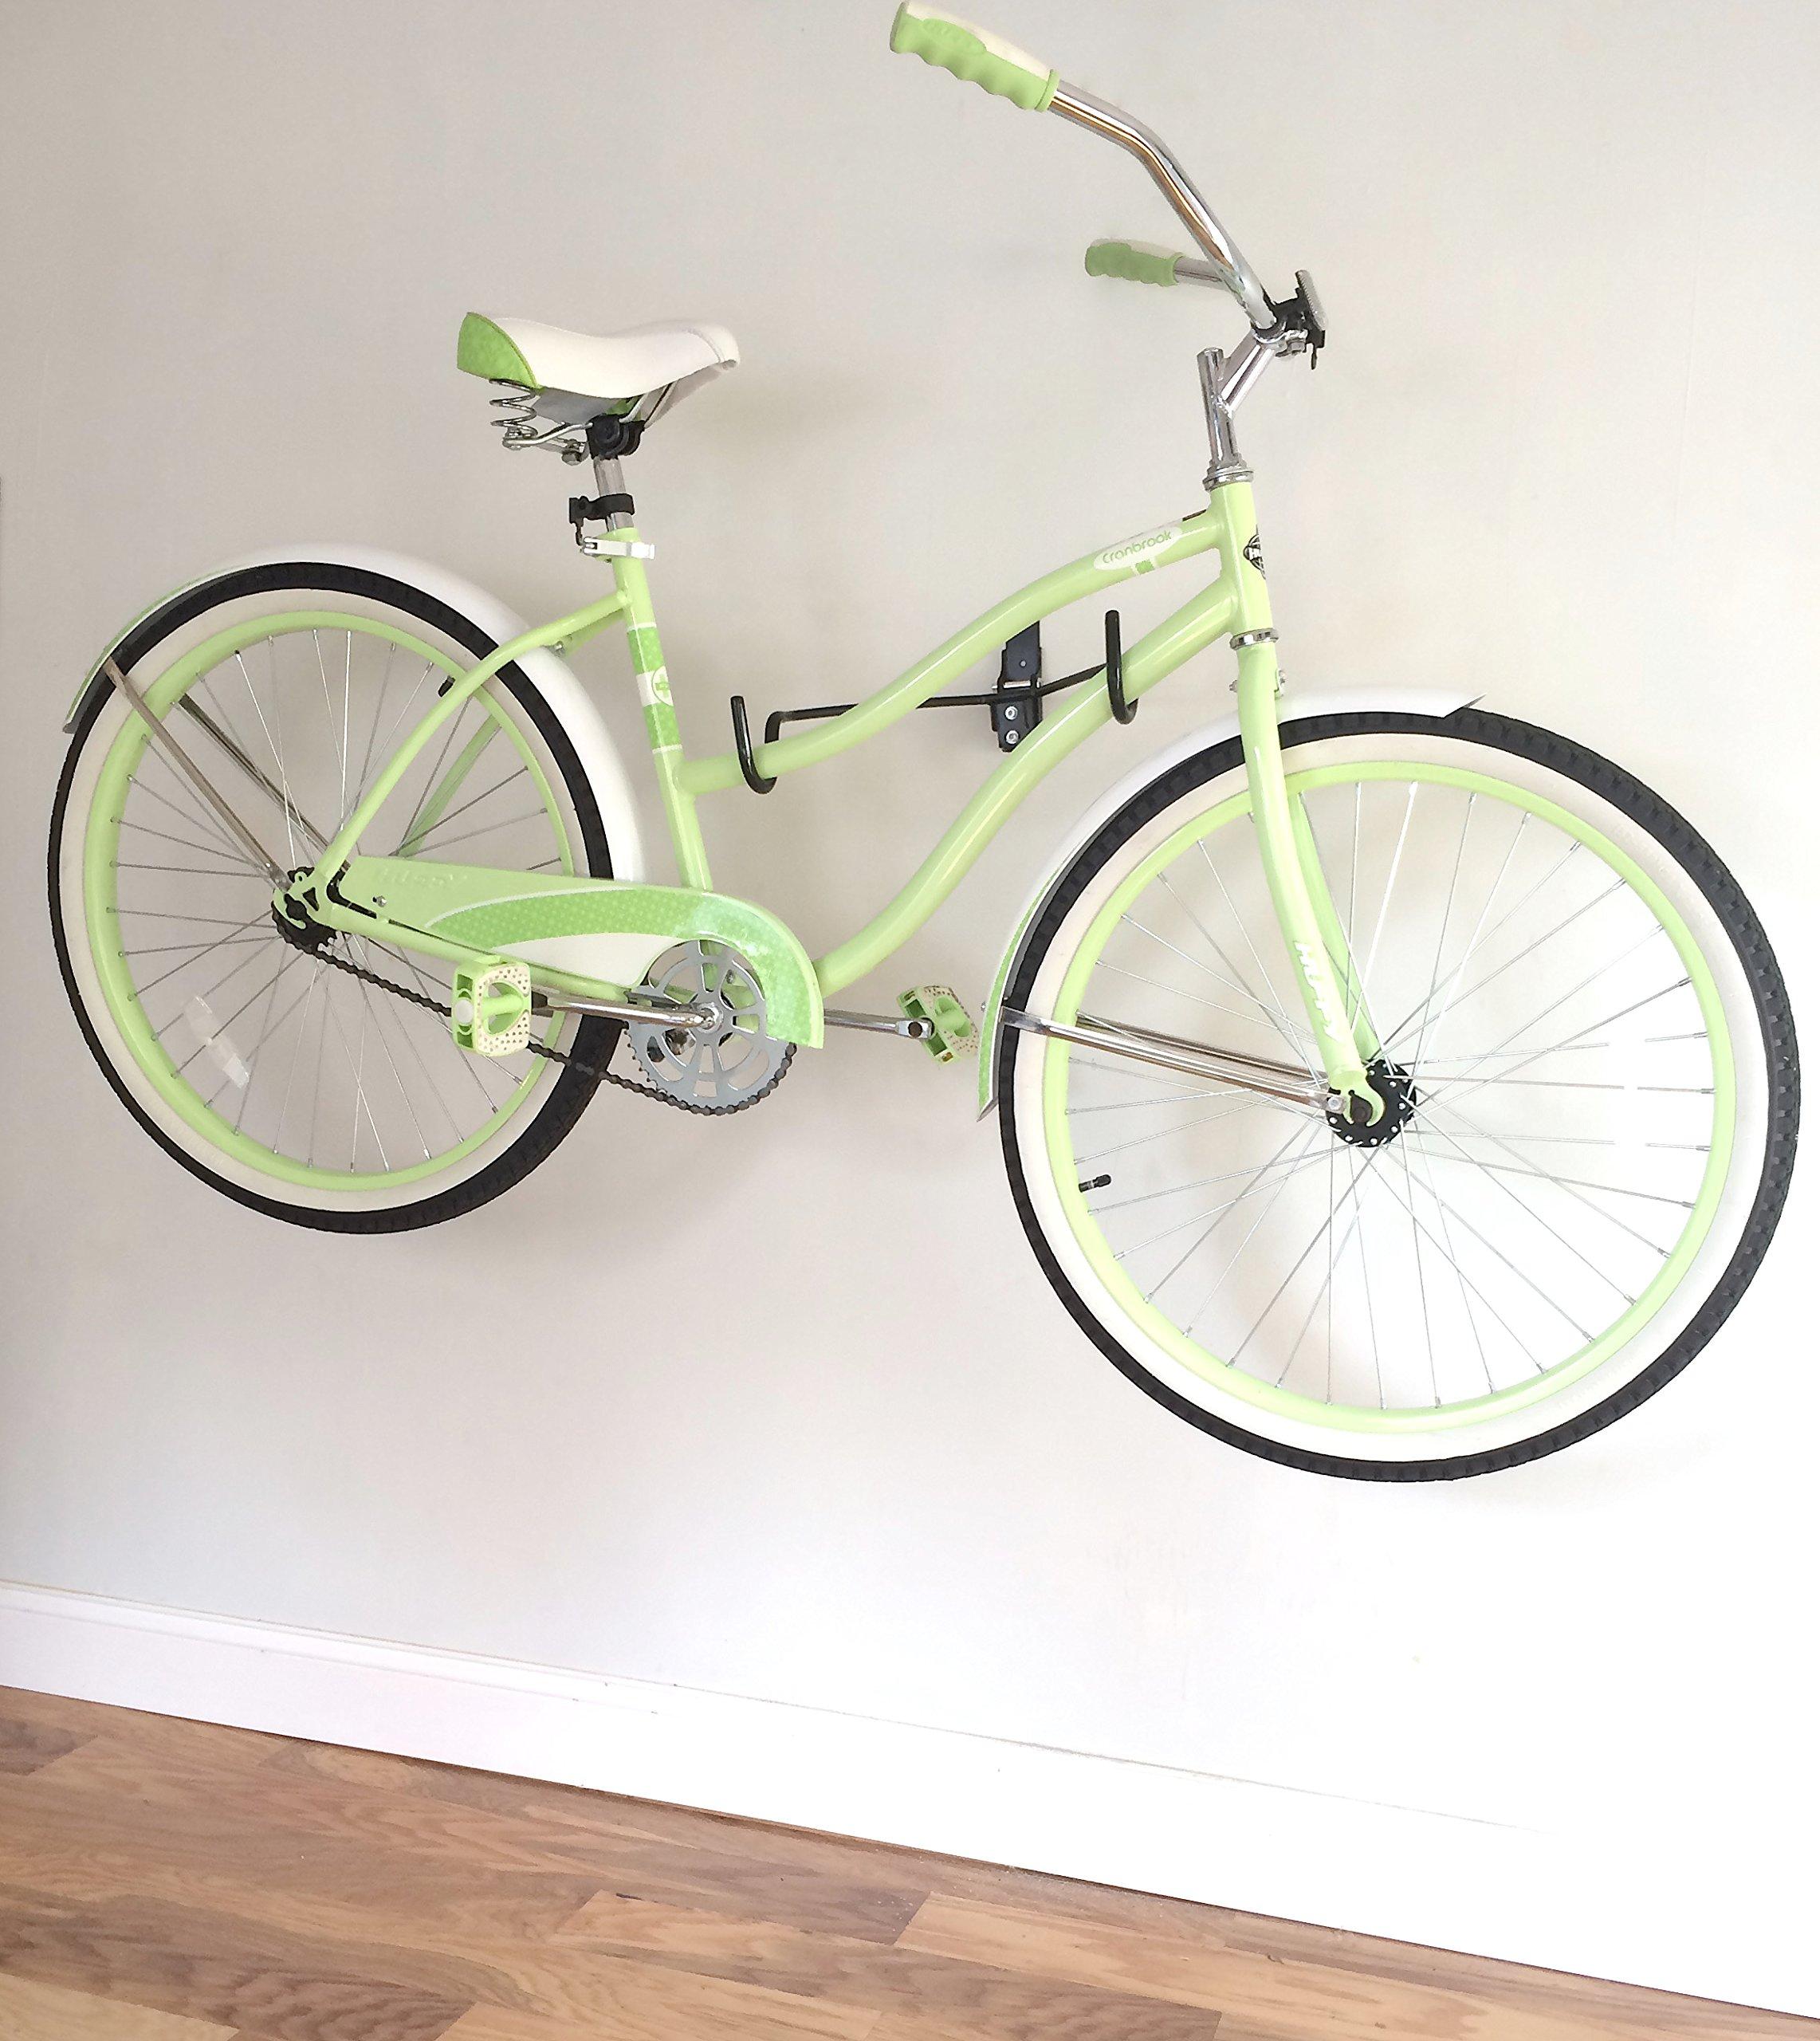 LifeStore Adjustable Tilt Wall Mount Bike Bicycle Storage Rack Hanger Hook by Coastal Provision (Image #2)